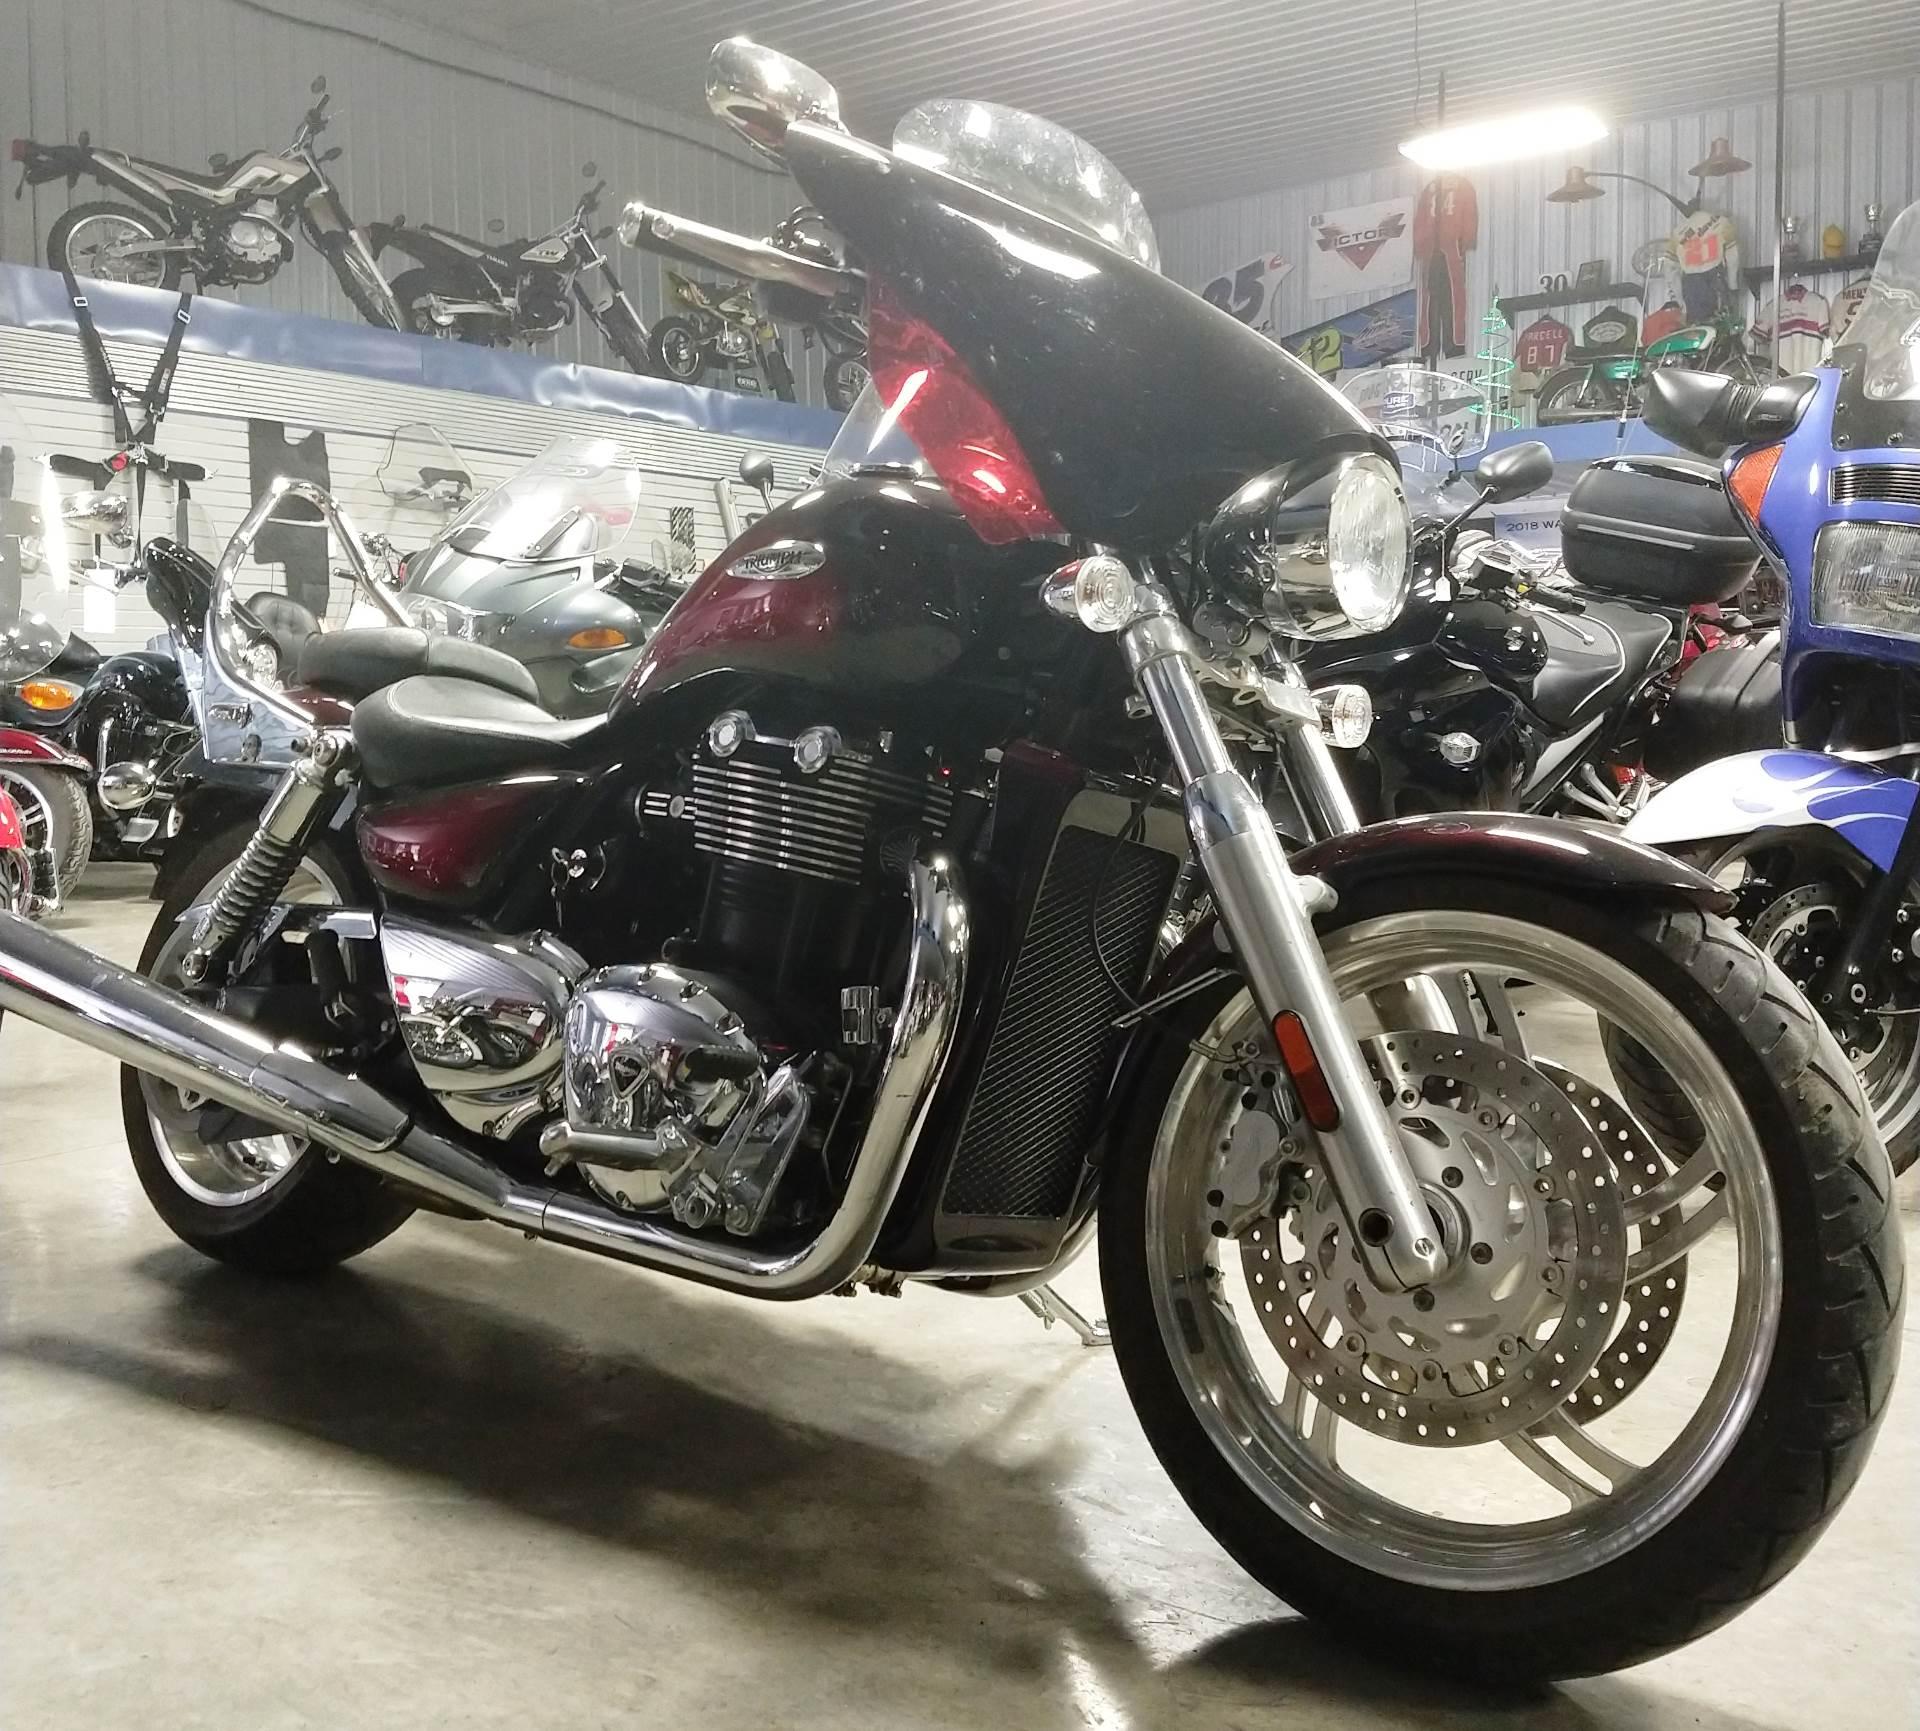 Used 2010 Triumph Thunderbird 1700 Motorcycles In Ottumwa Ia